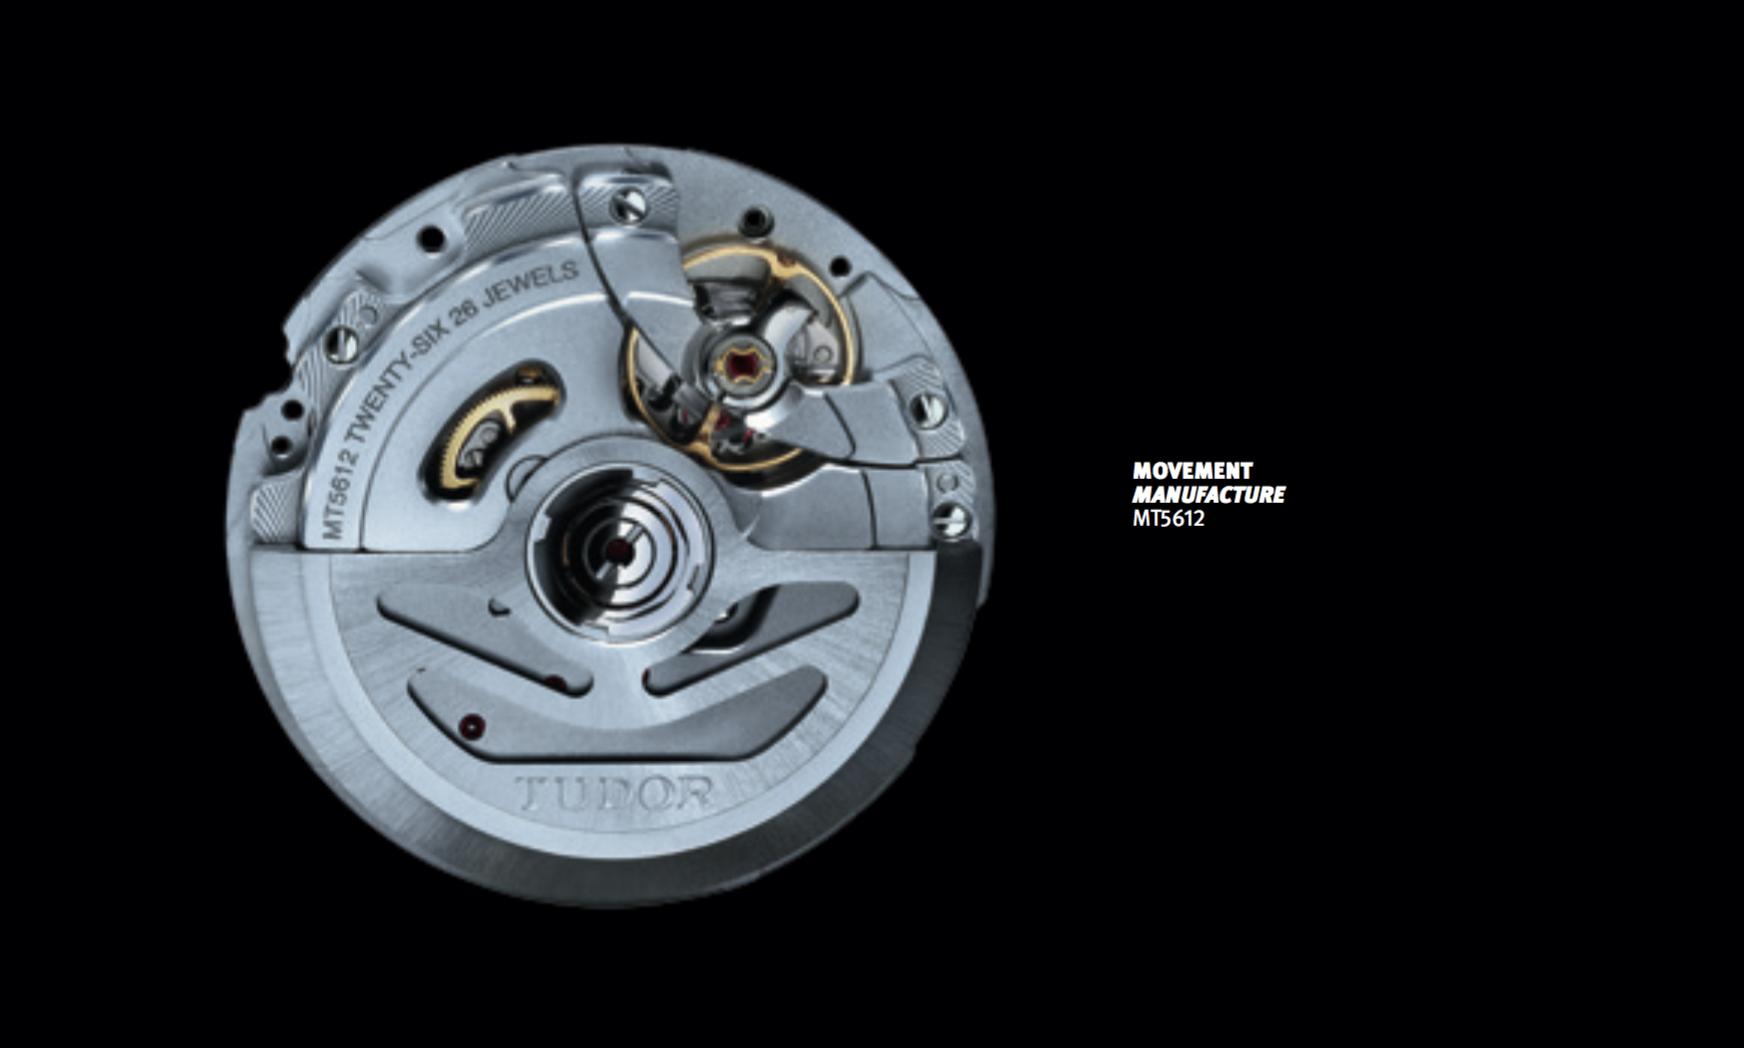 Tudor MT5612 Self-Winding Mechanical Movement